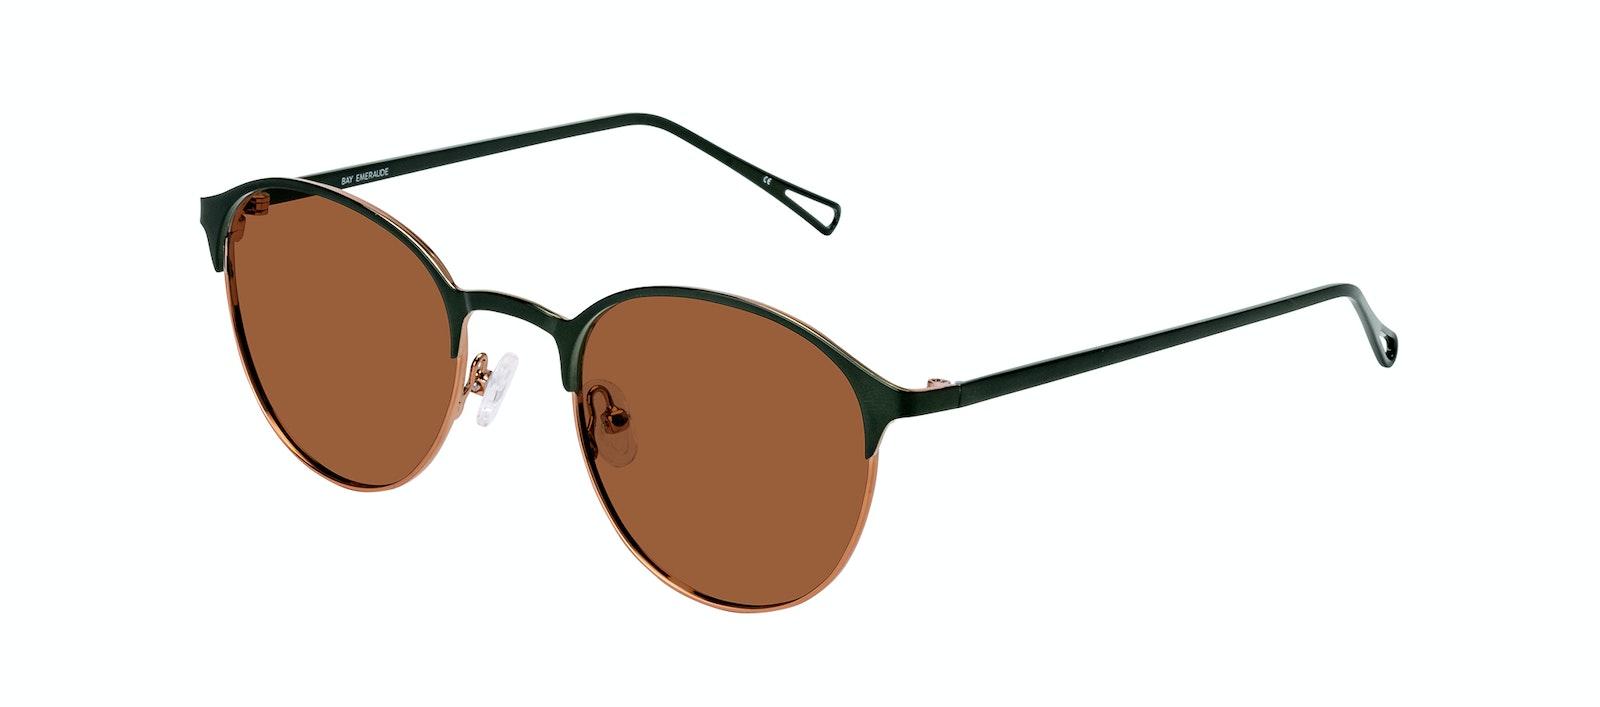 Affordable Fashion Glasses Round Sunglasses Women Bay Emeraude Tilt